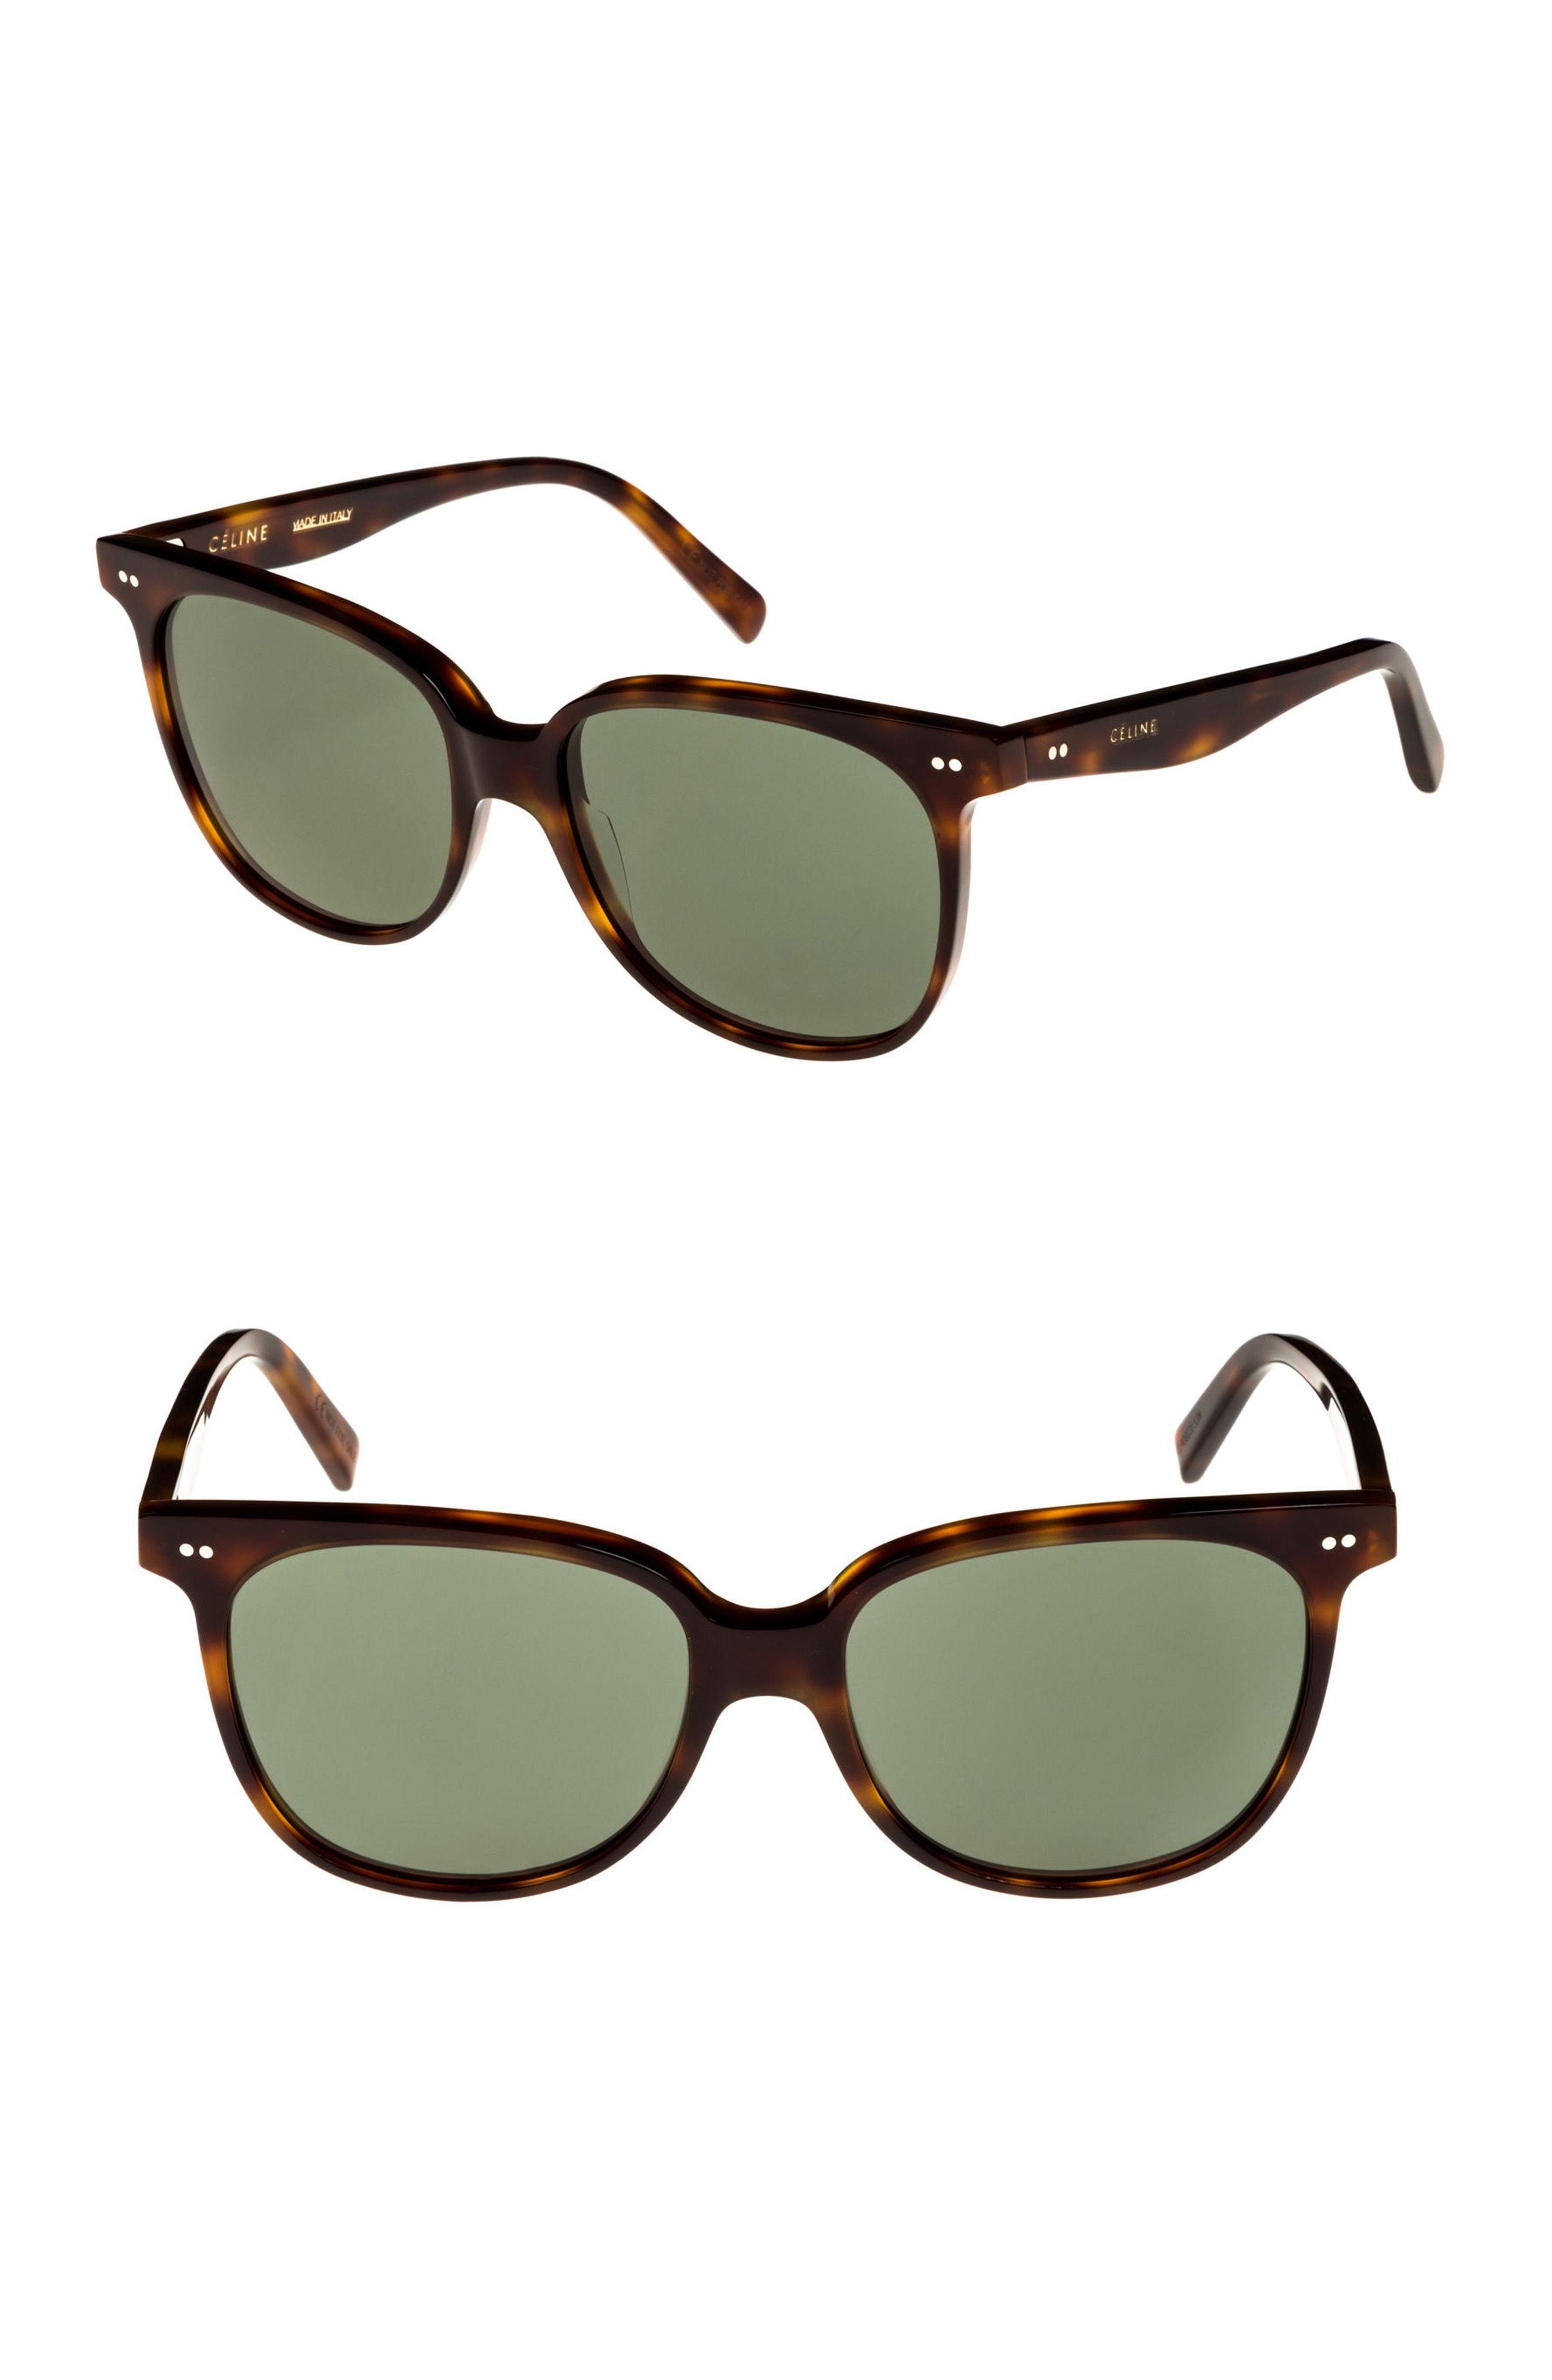 2ccf69671f Lyst - Céline 57mm Square Sunglasses - Blonde Havana  Green in Green